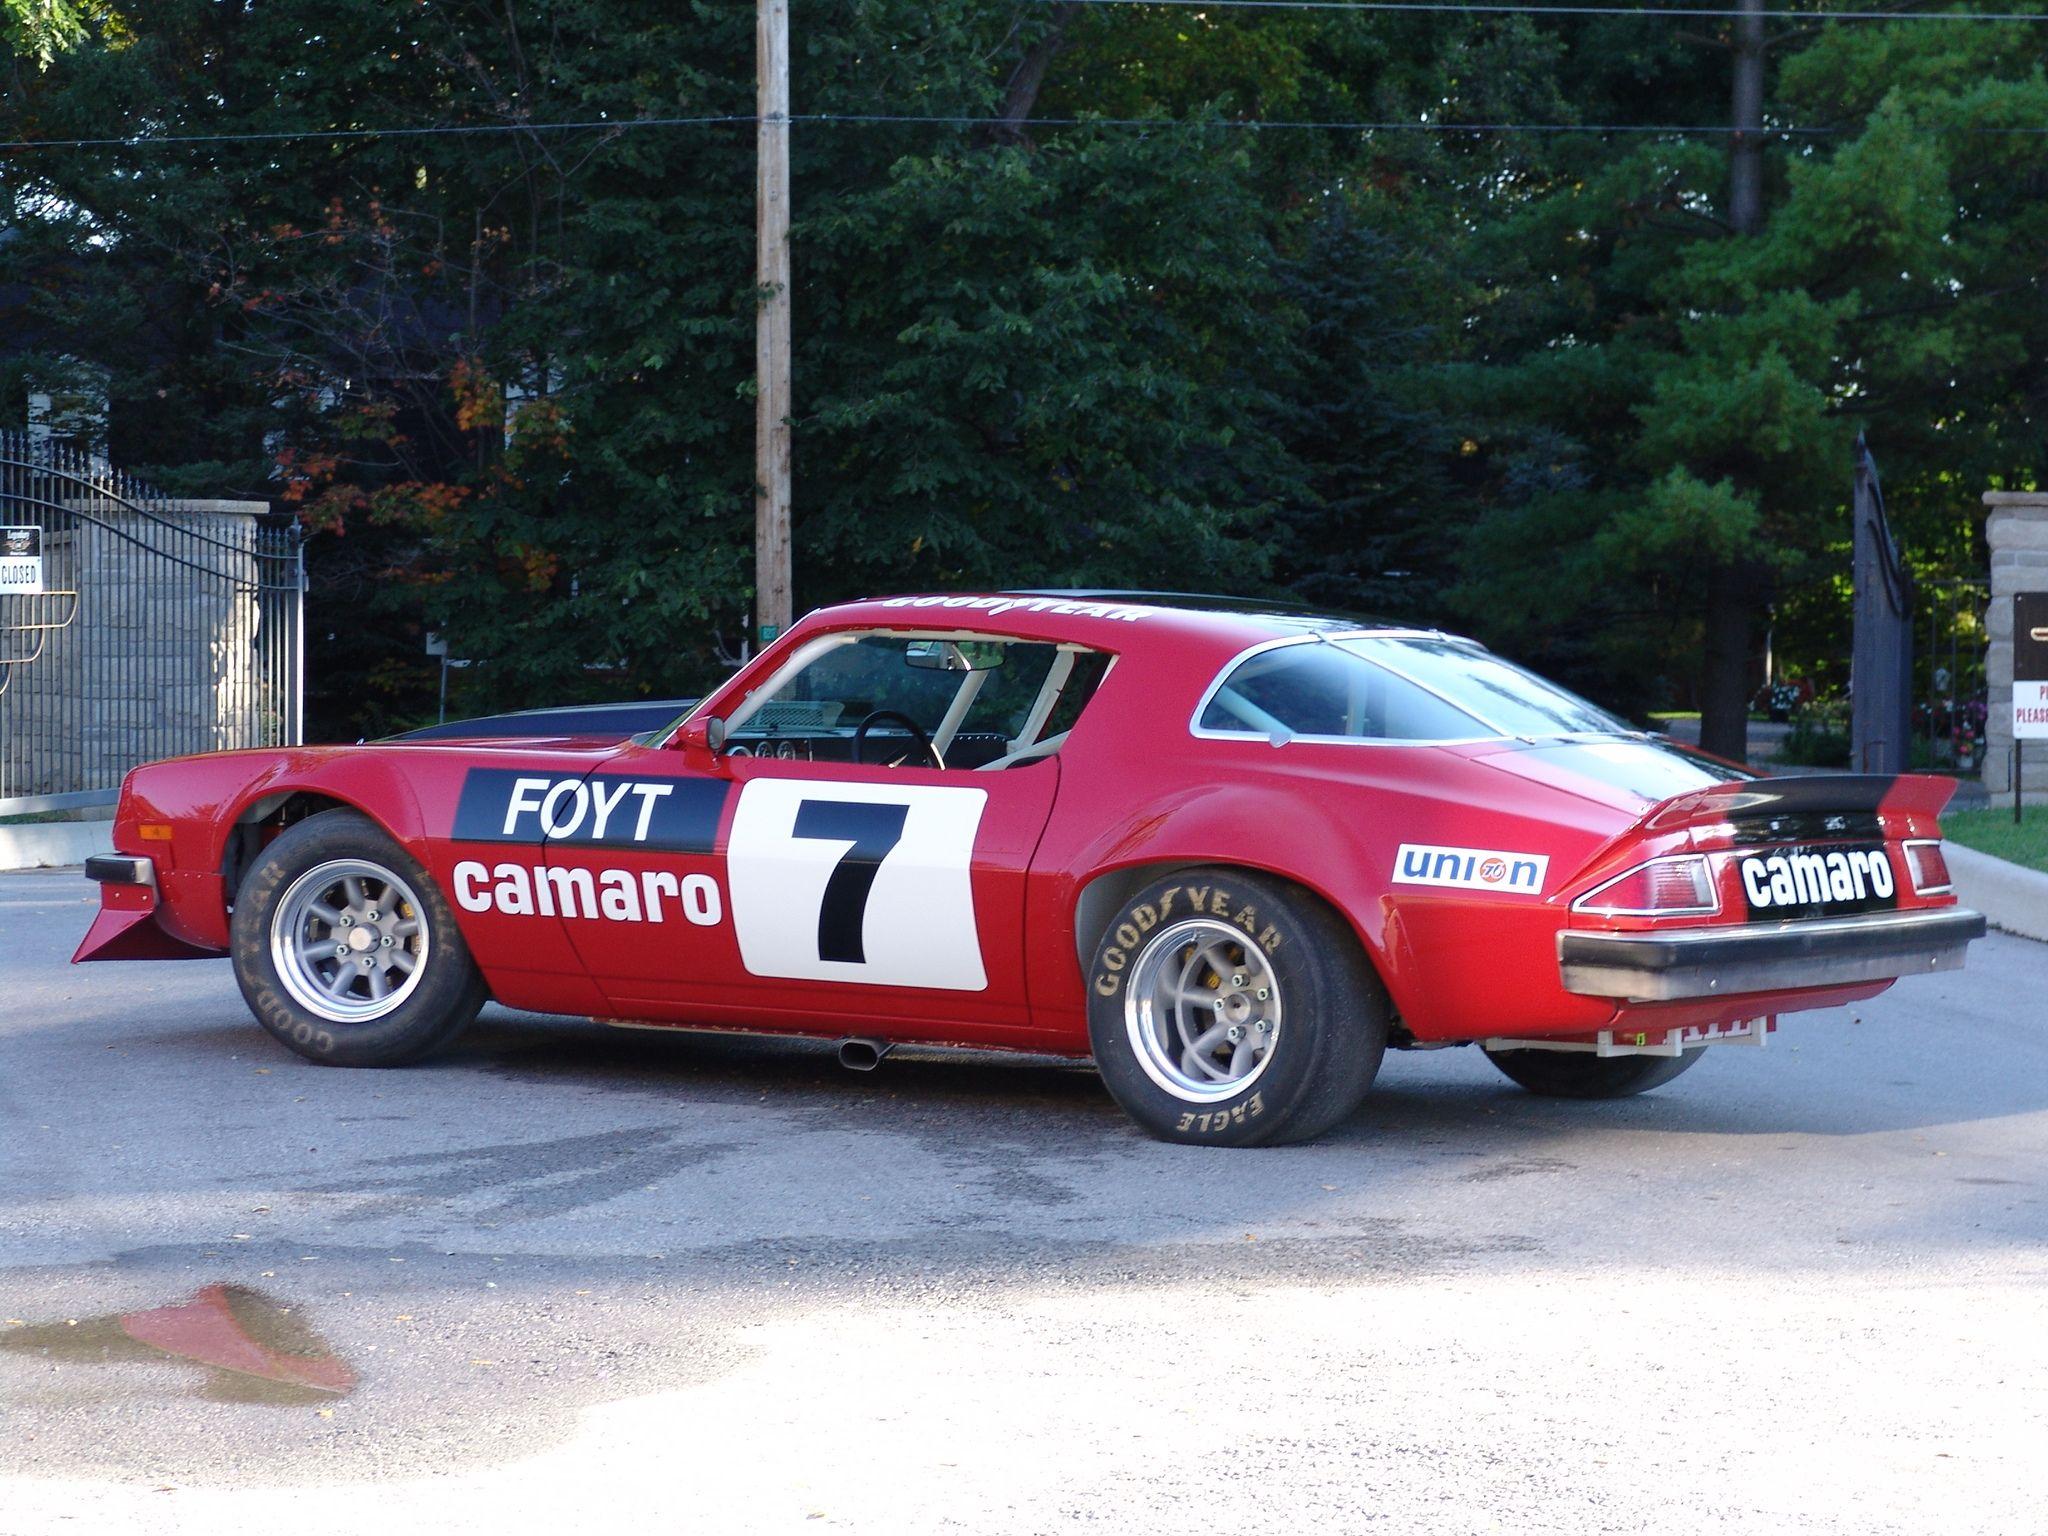 1975 Iroc Camaro Race Car For Sale Race Cars Chevrolet Camaro Camaro Iroc